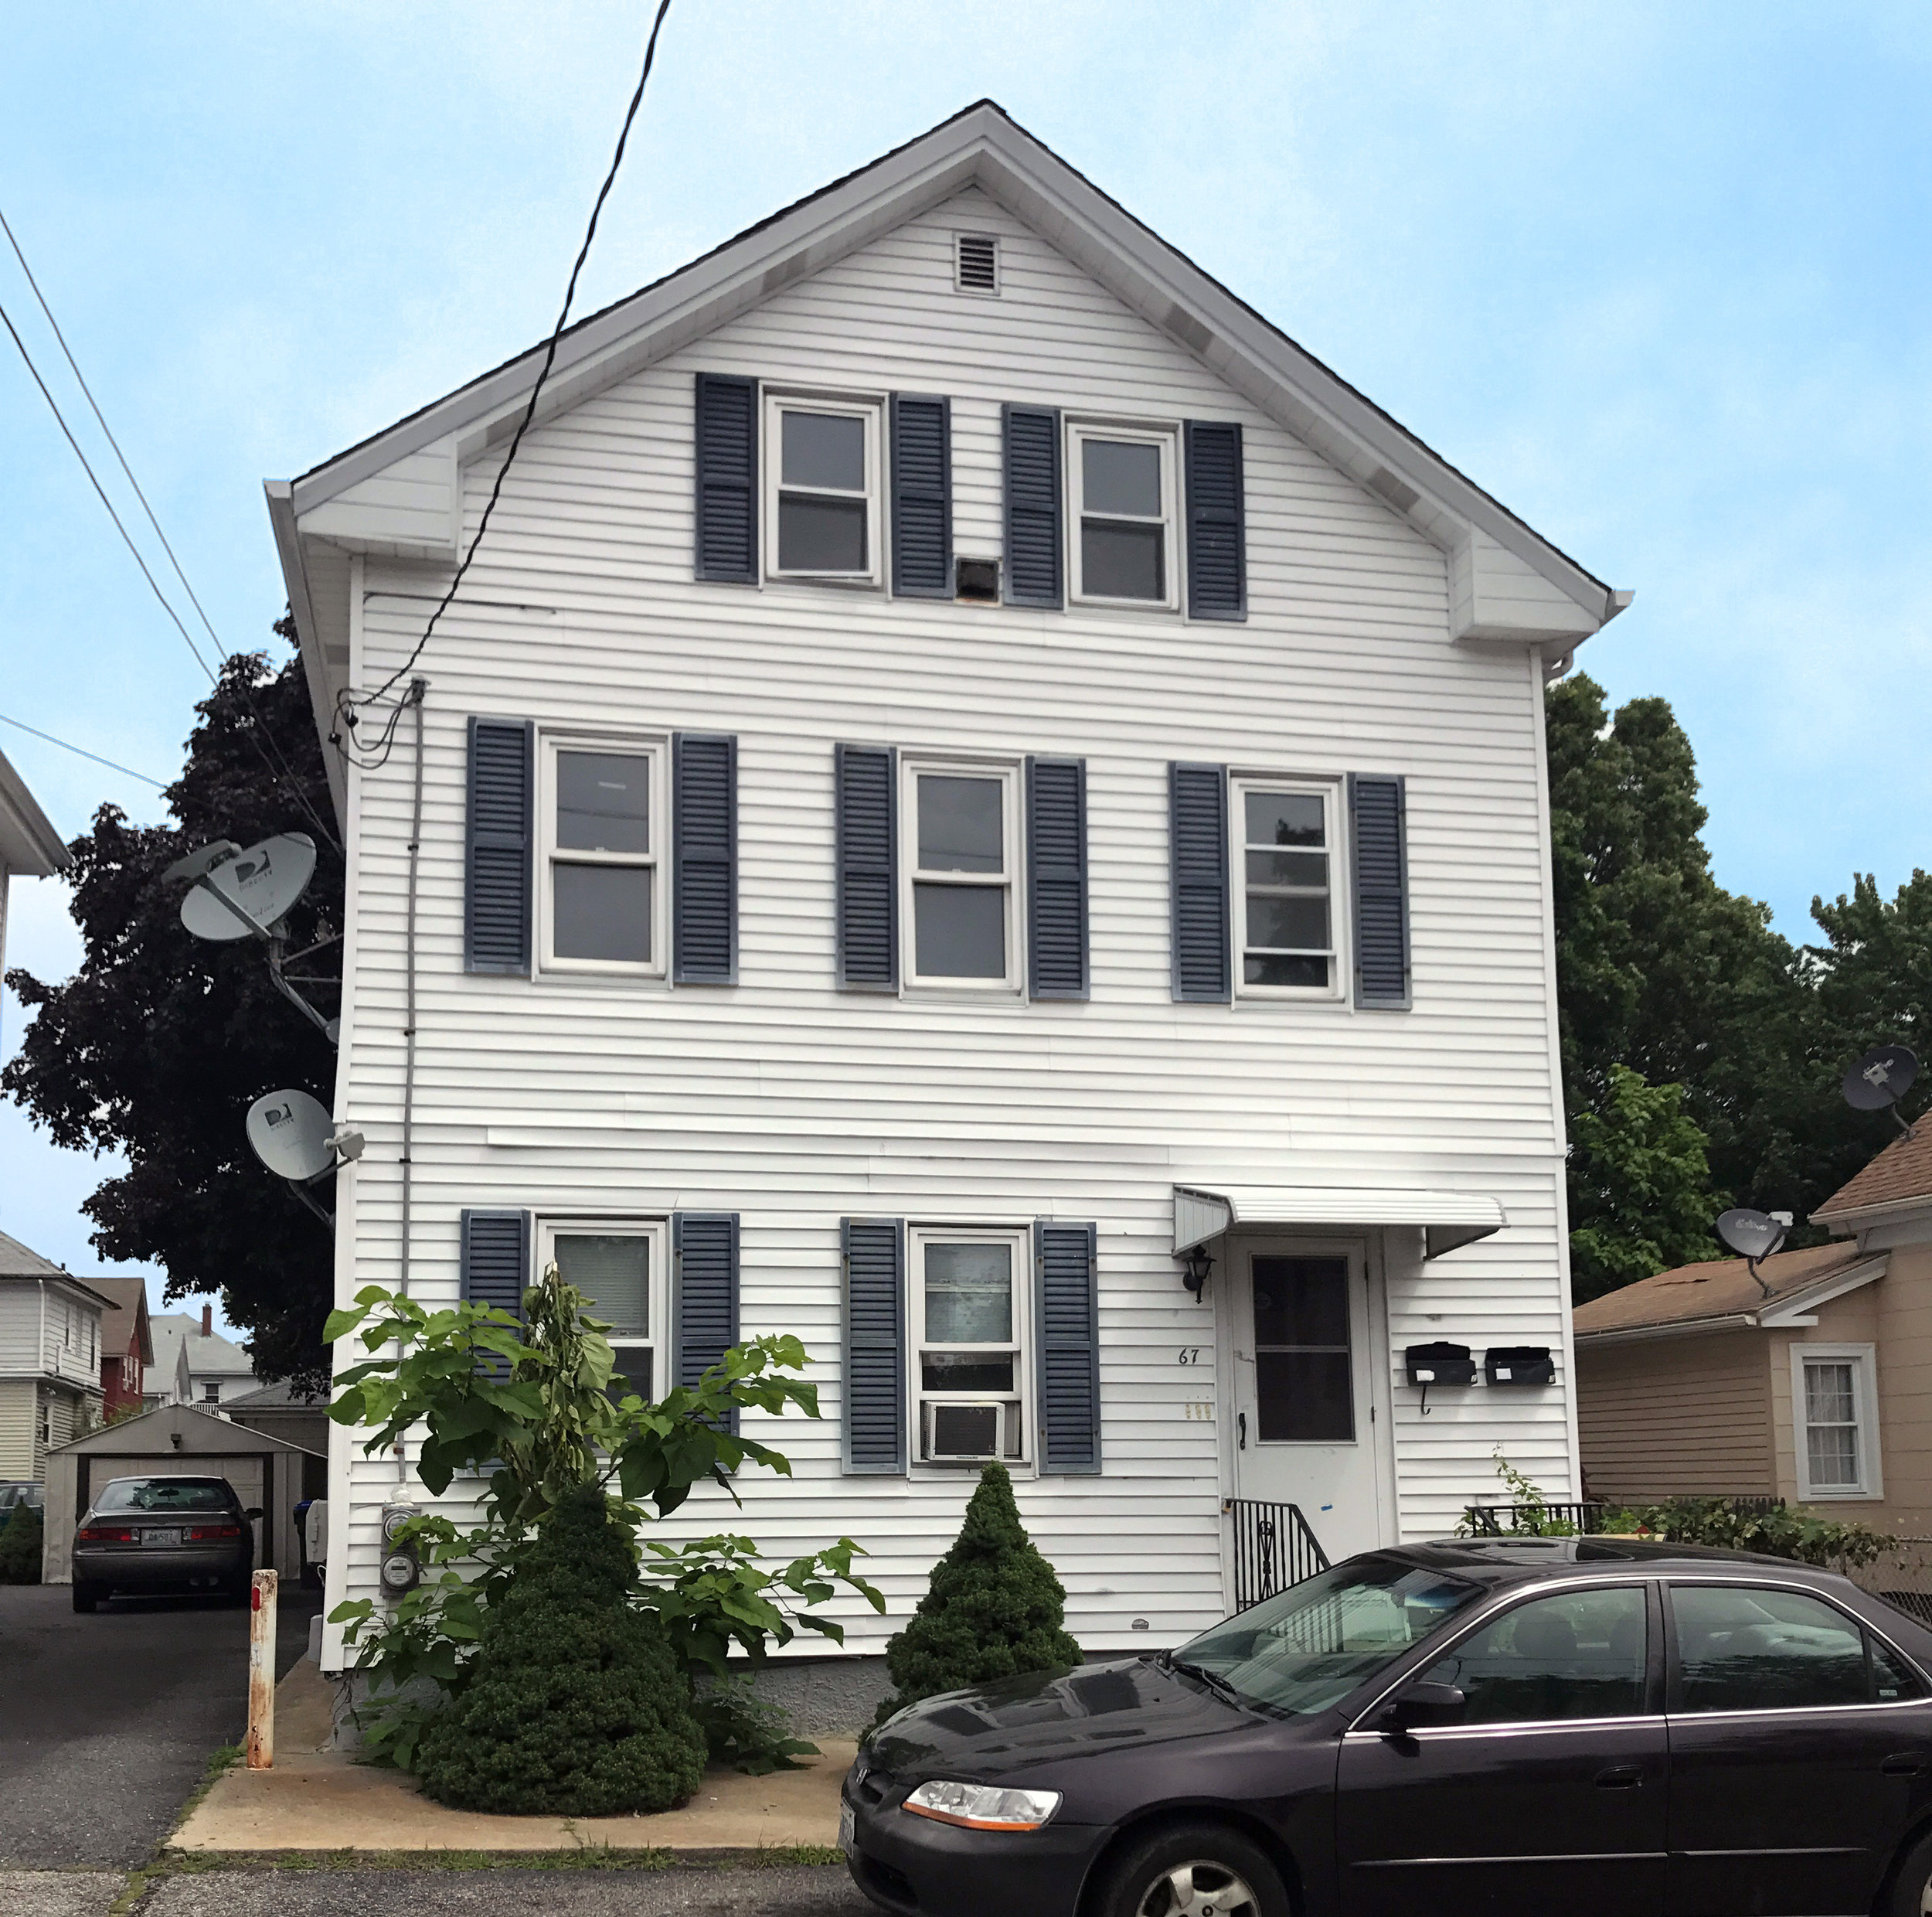 Providence, RI - Closed July 27, 2017